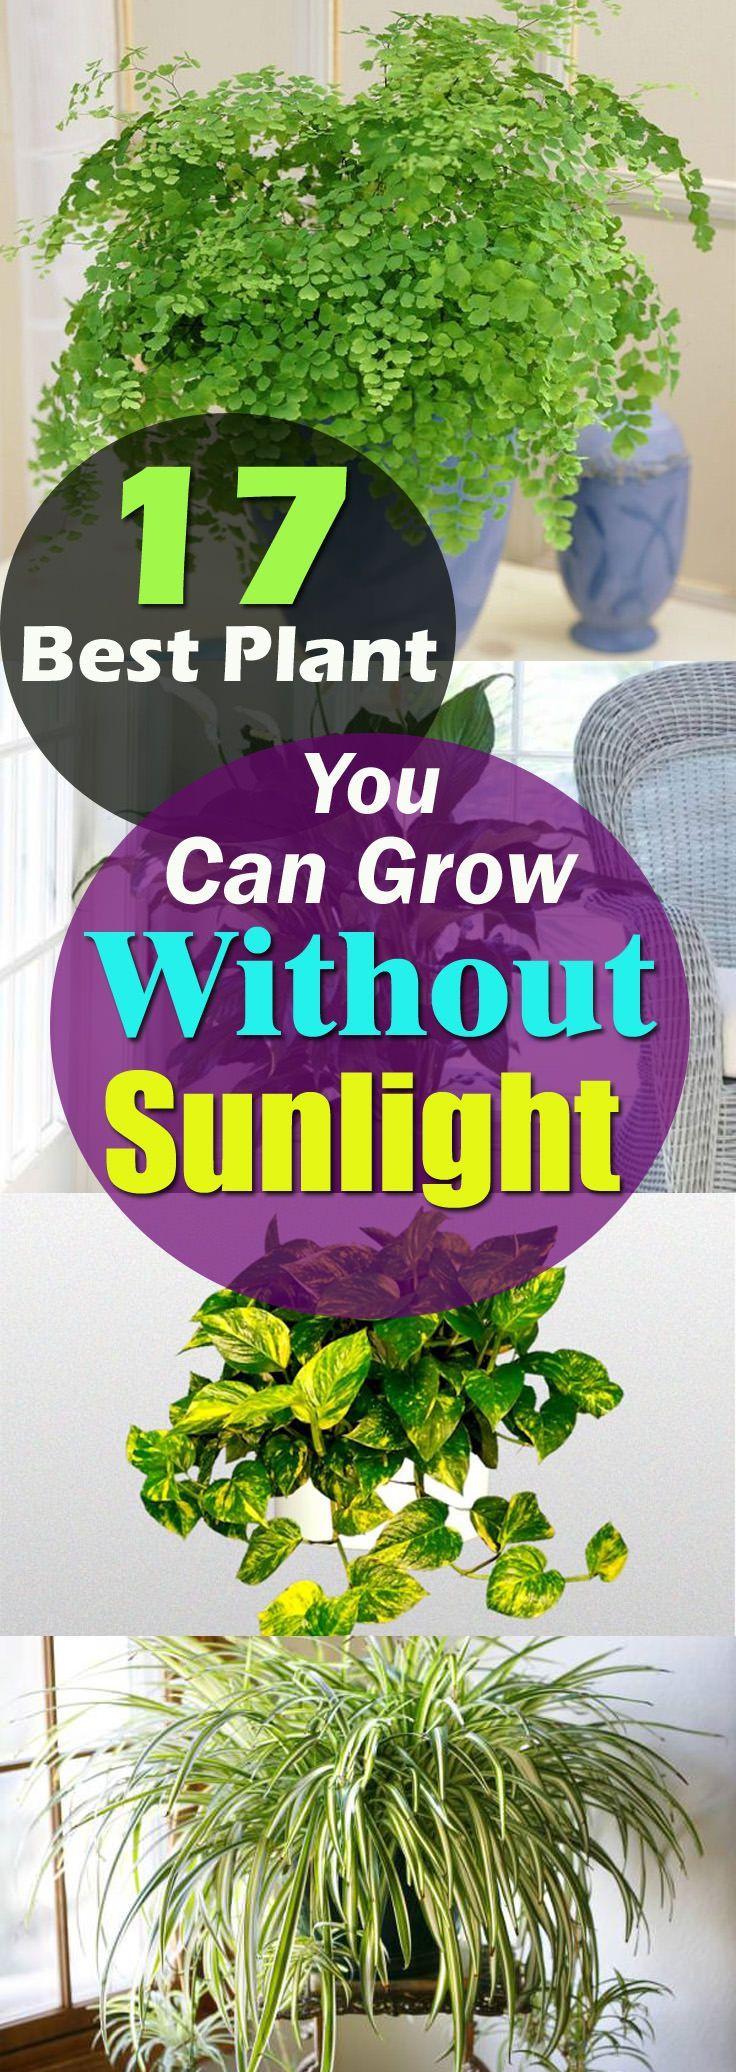 best house plant care images on pinterest vegetable garden